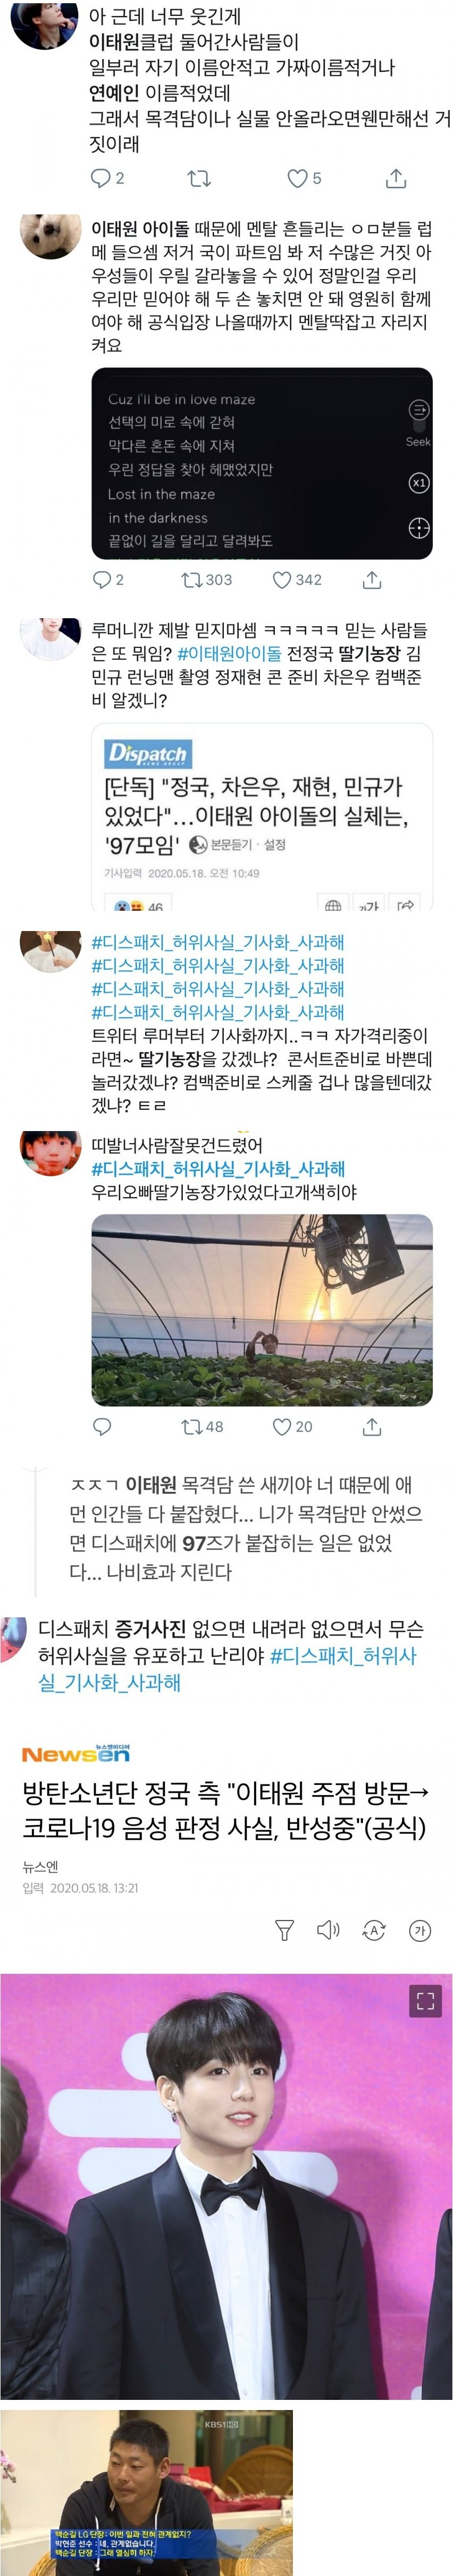 BTS 정국 이태원 방문 언냐들 피꺼솟